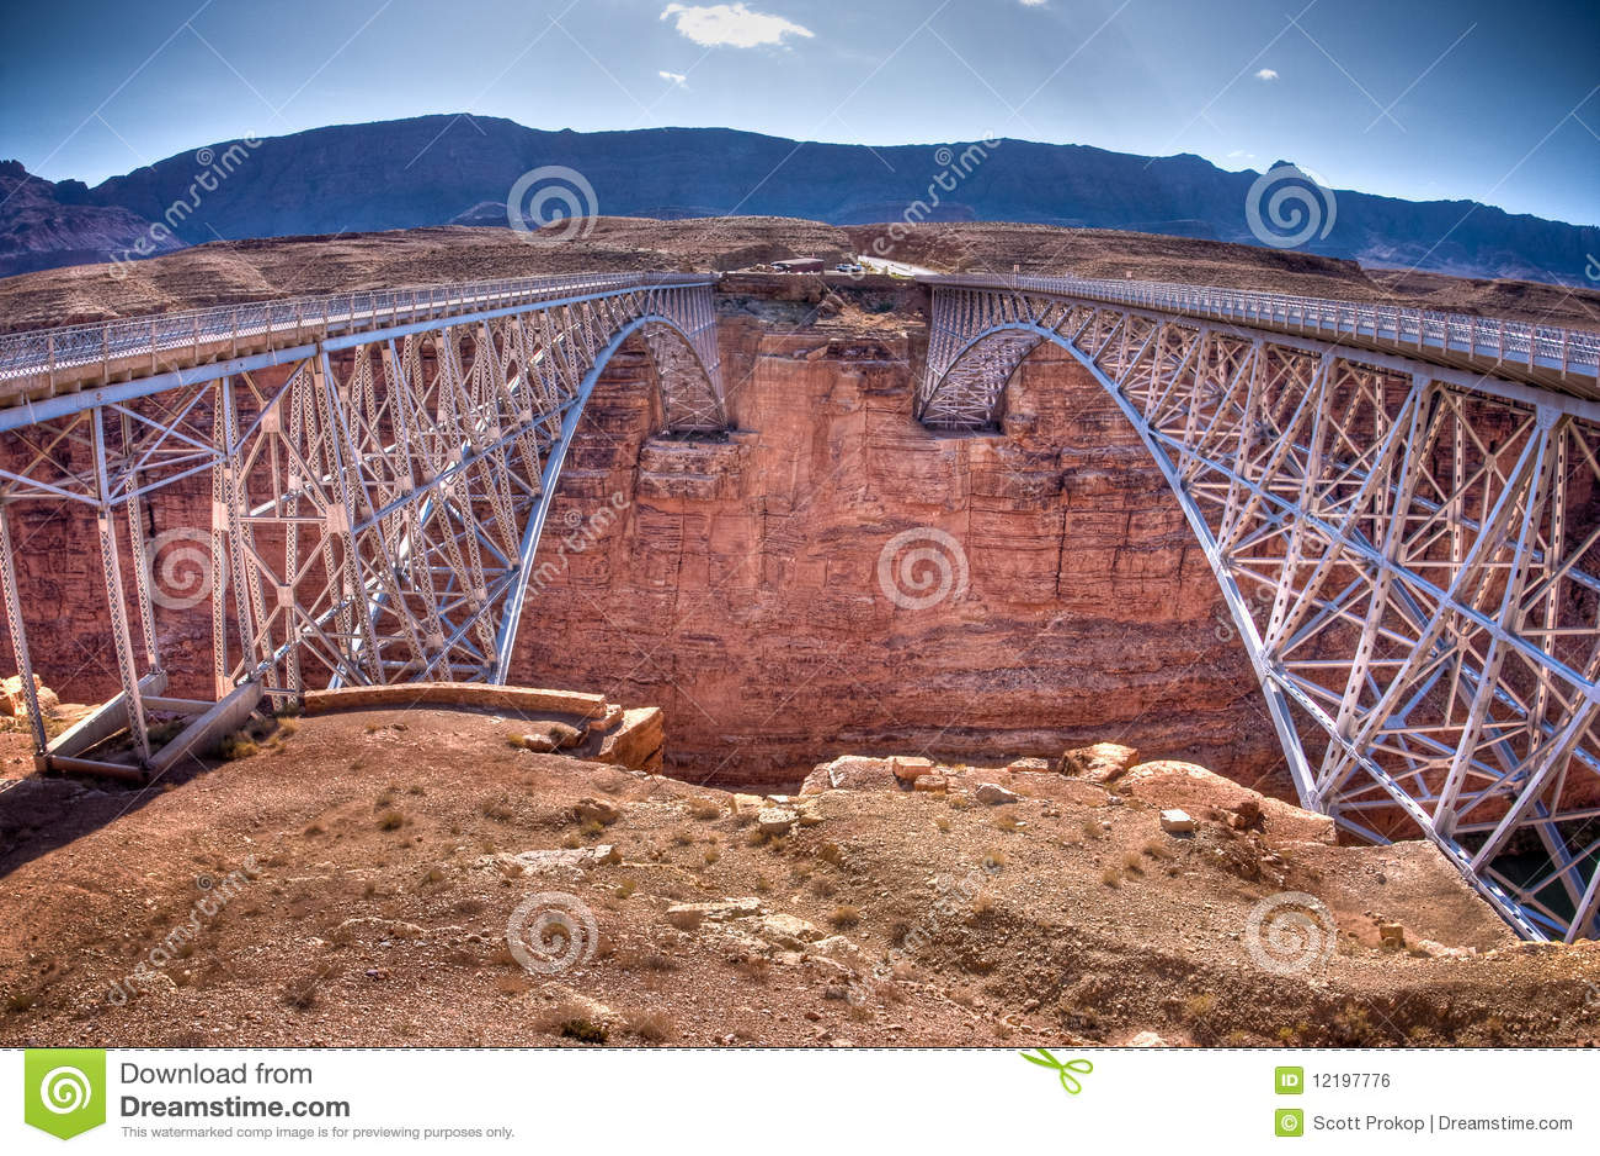 Navajo Bridge Over The Grand Canyon Royalty Free Stock